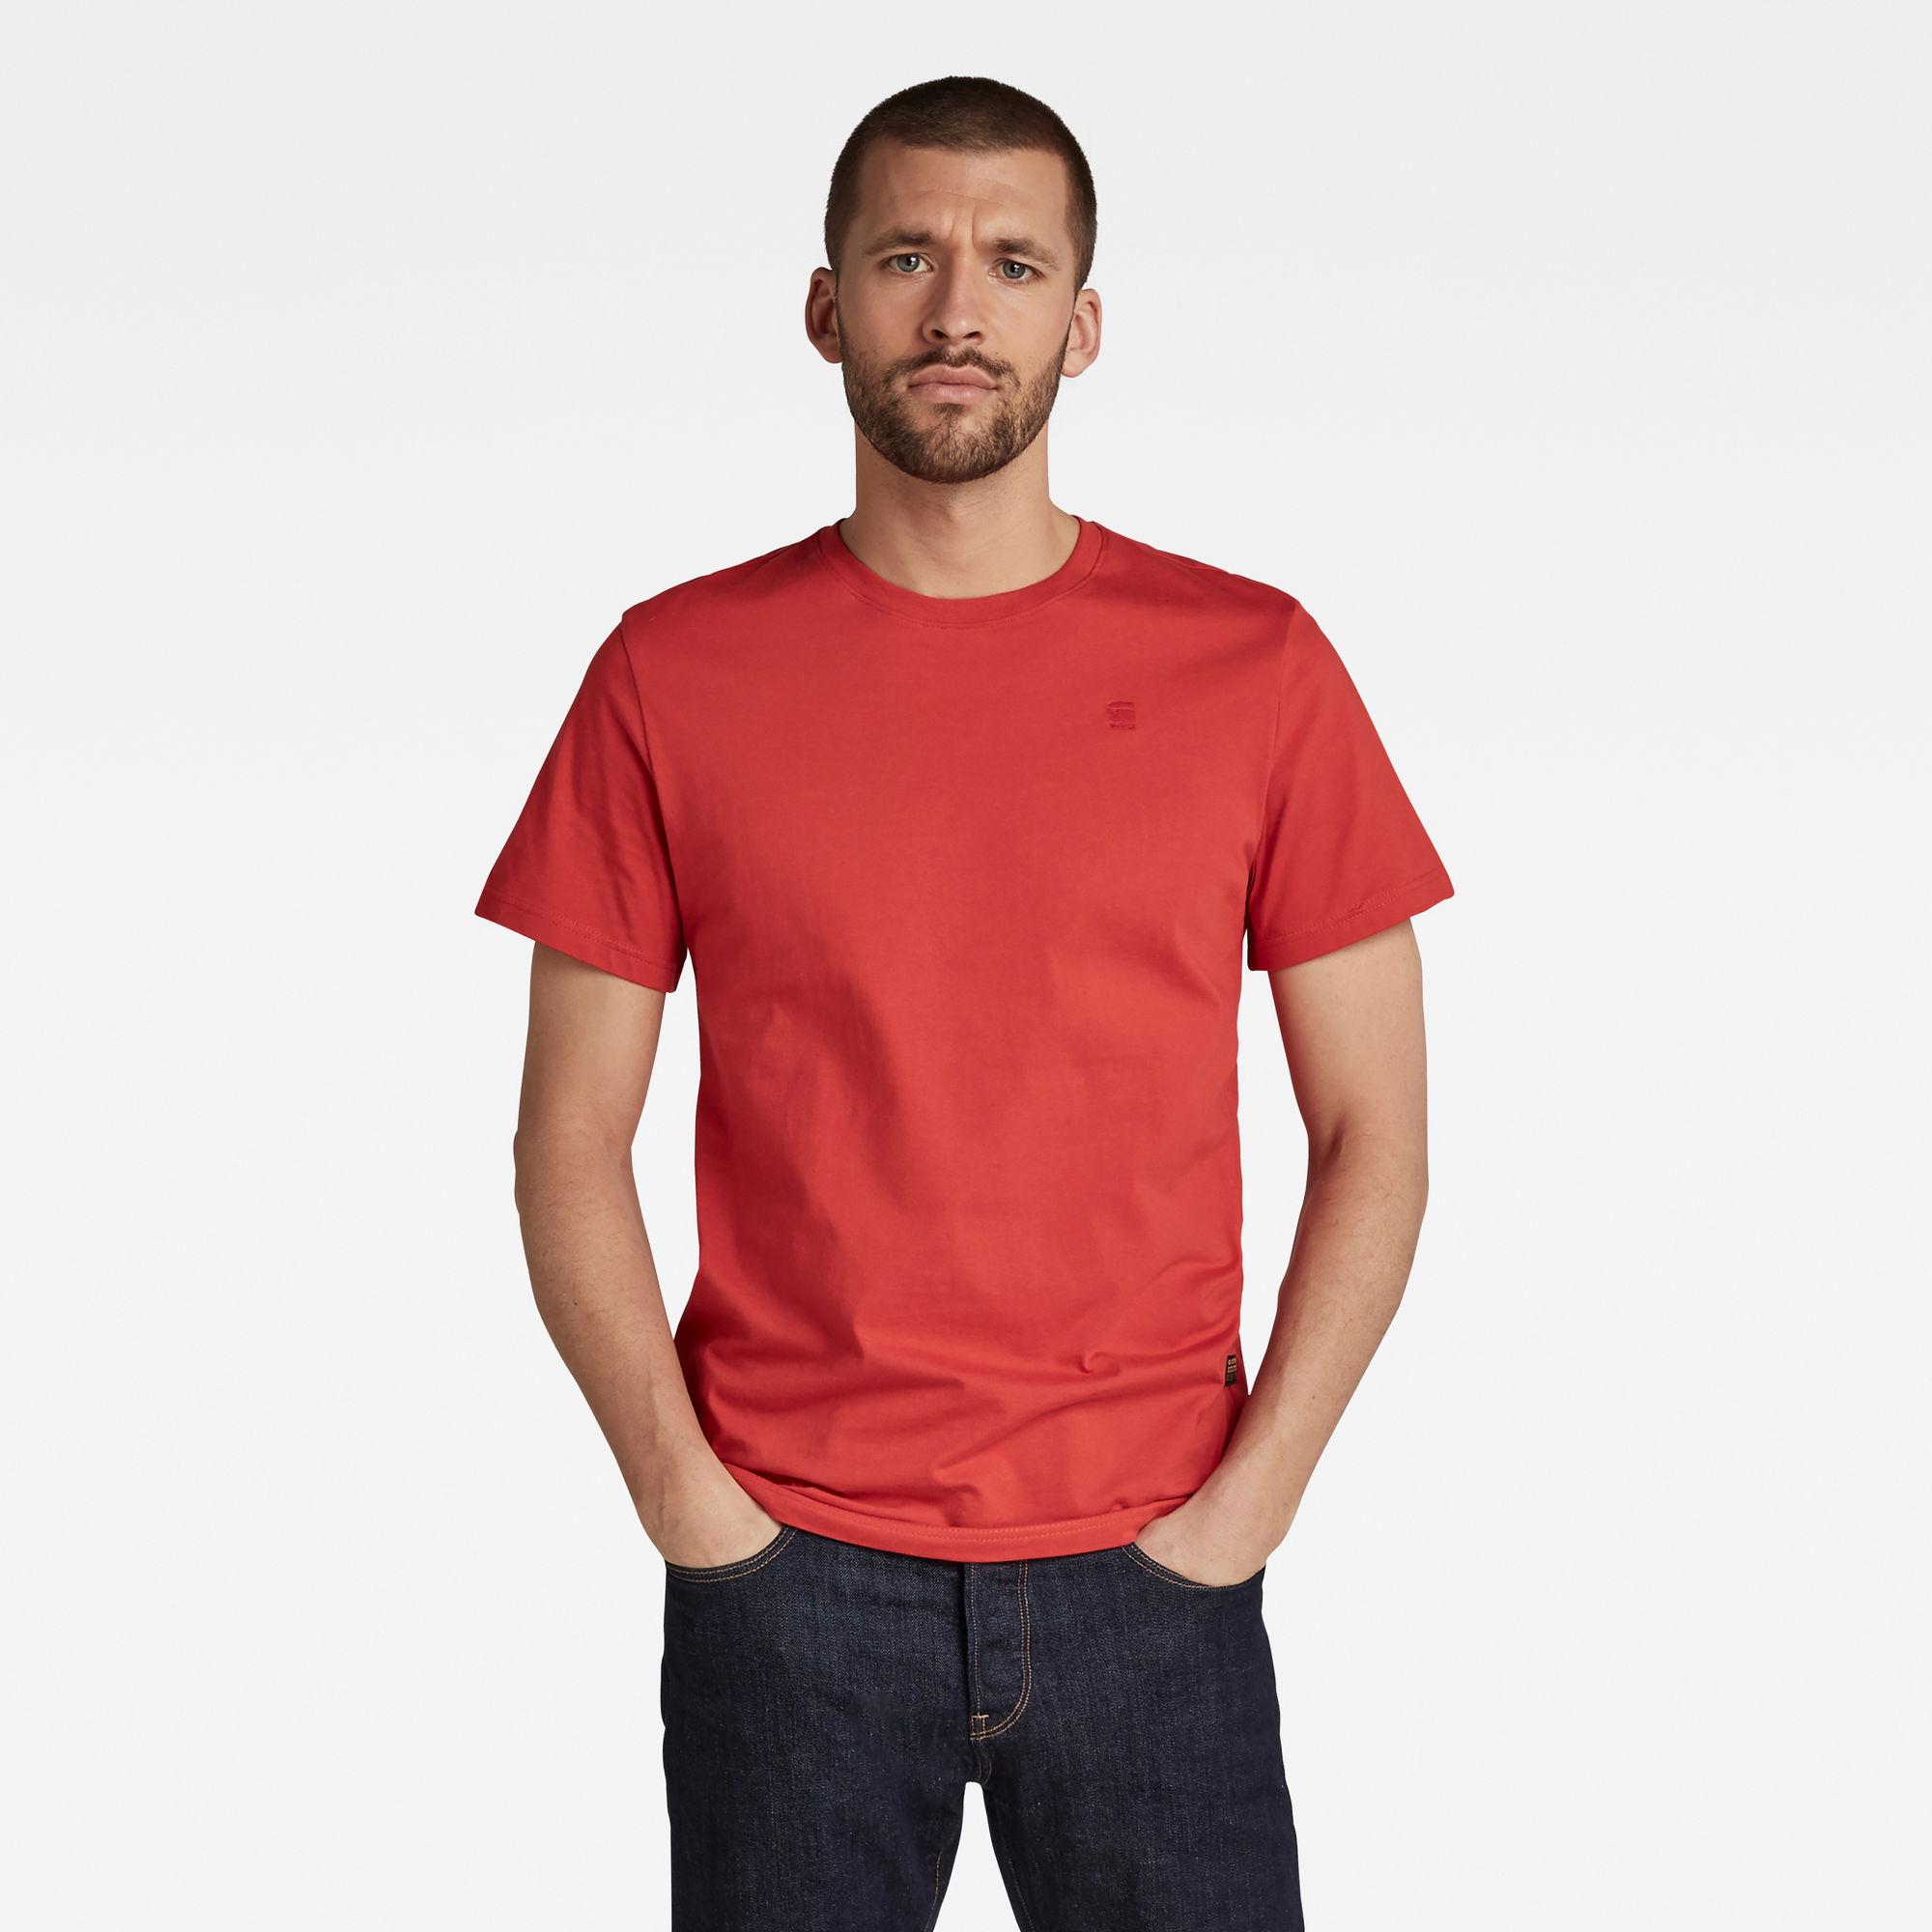 G-Star RAW Heren Base-S T-Shirt Rood